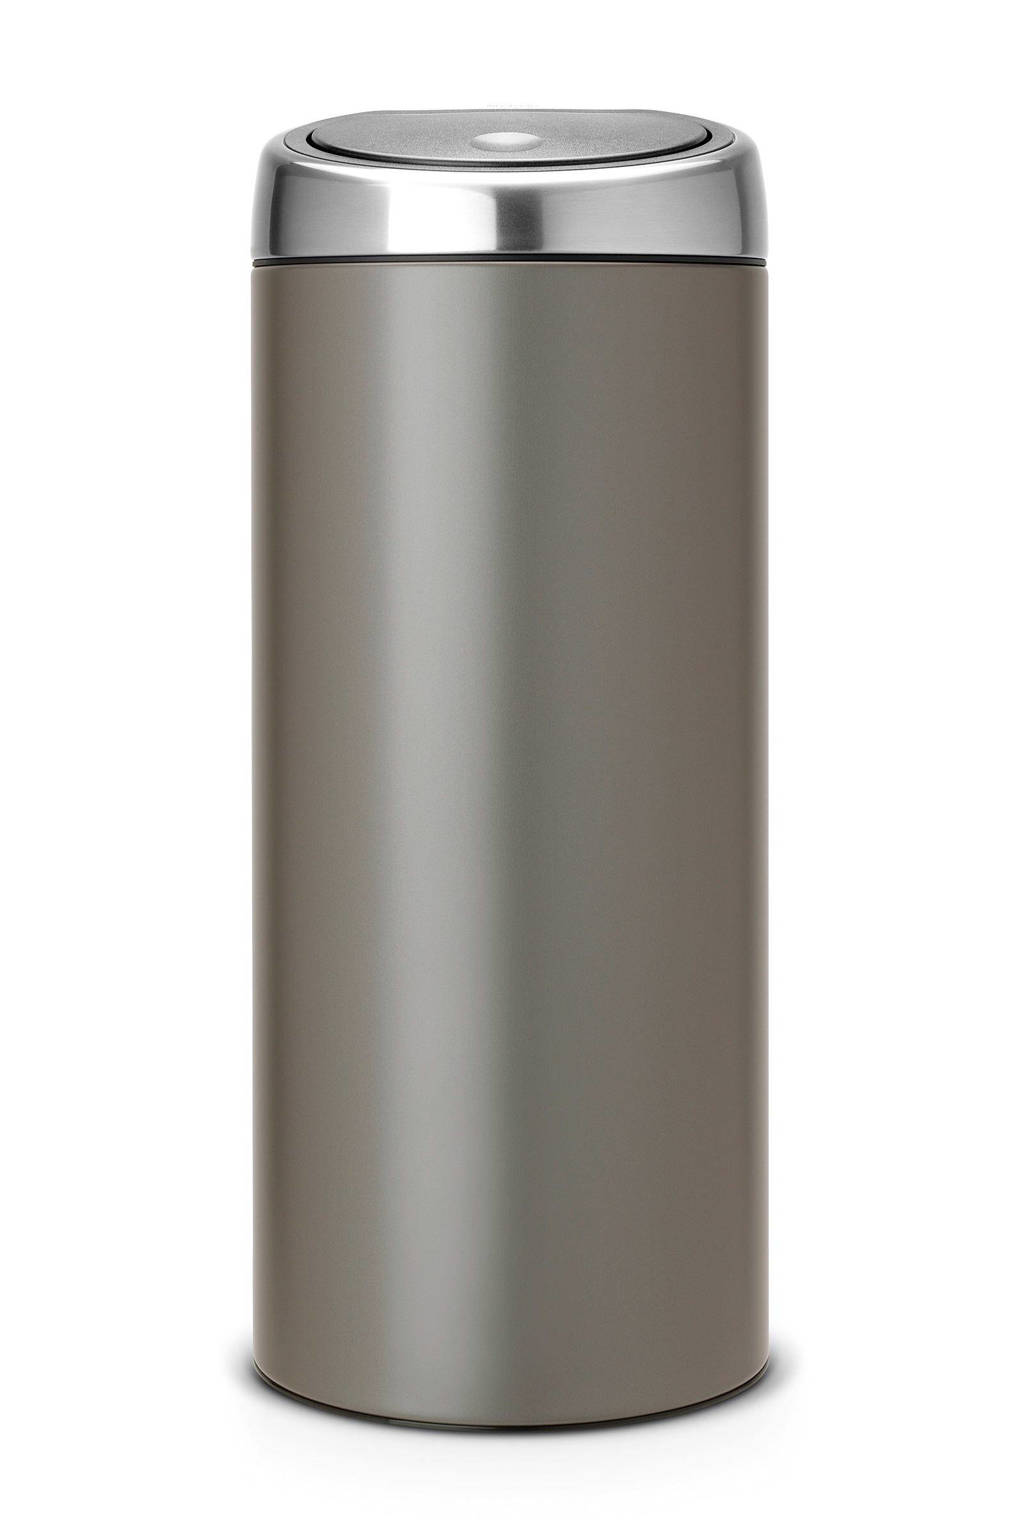 Brabantia Touch Bin Afvalverzamelaar 30 Liter.Brabantia Touch Bin 30 Liter Prullenbak Wehkamp